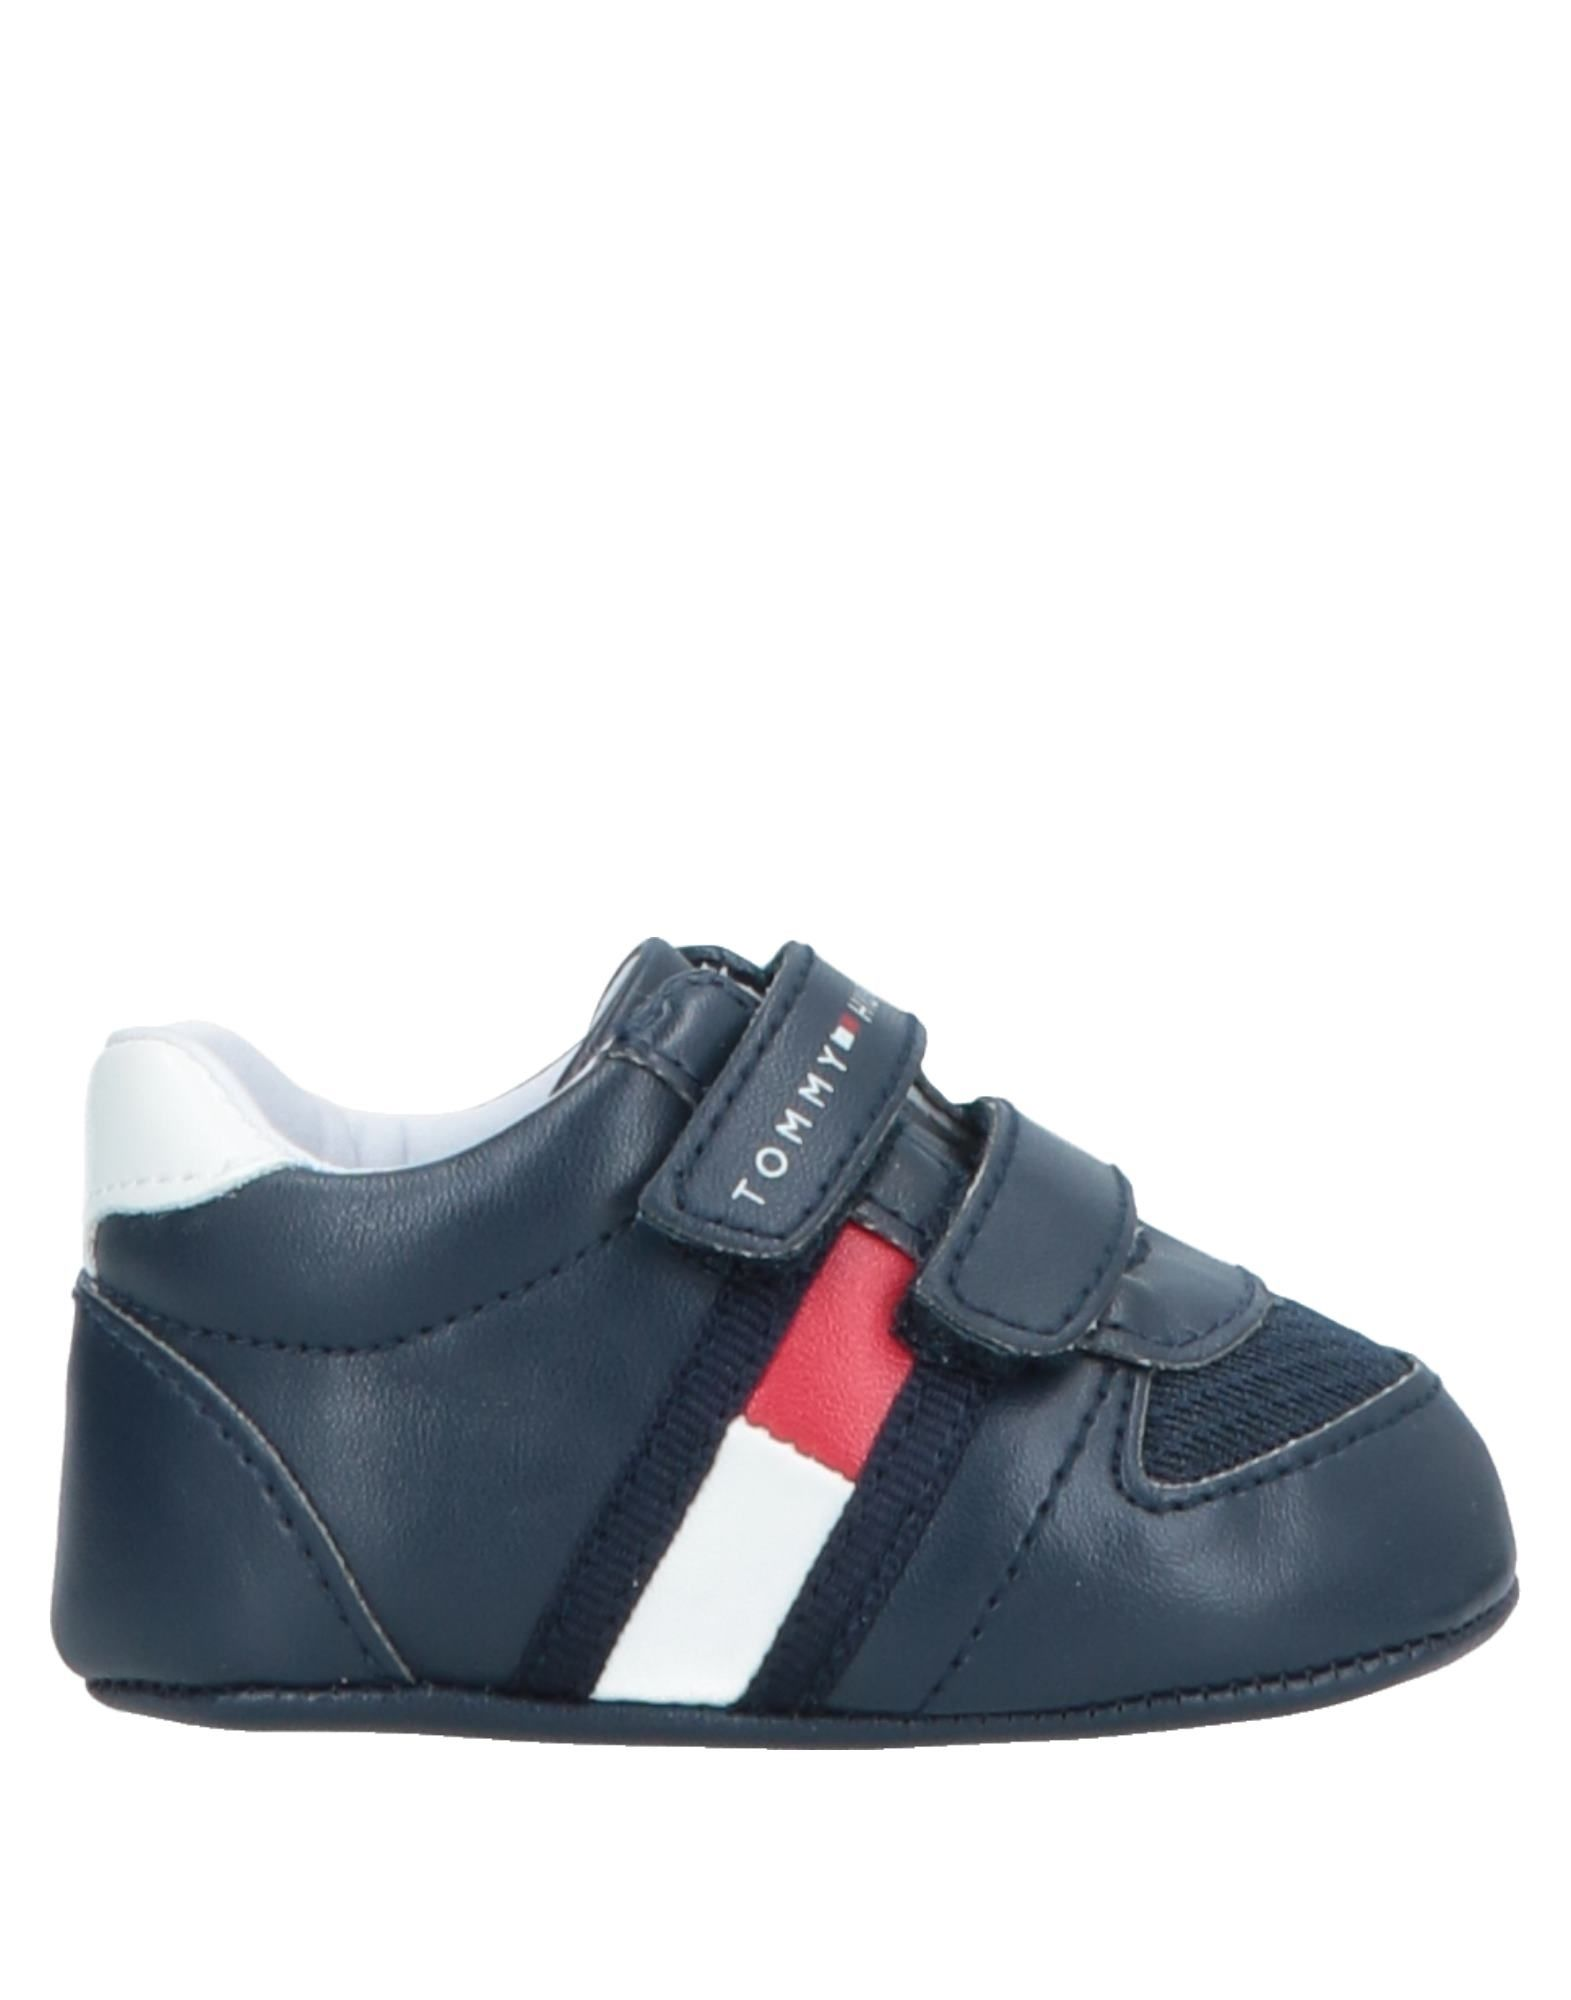 9104b6d2afe8c Tommy Hilfiger Newborn Shoes Boy 0-24 months online on YOOX United ...